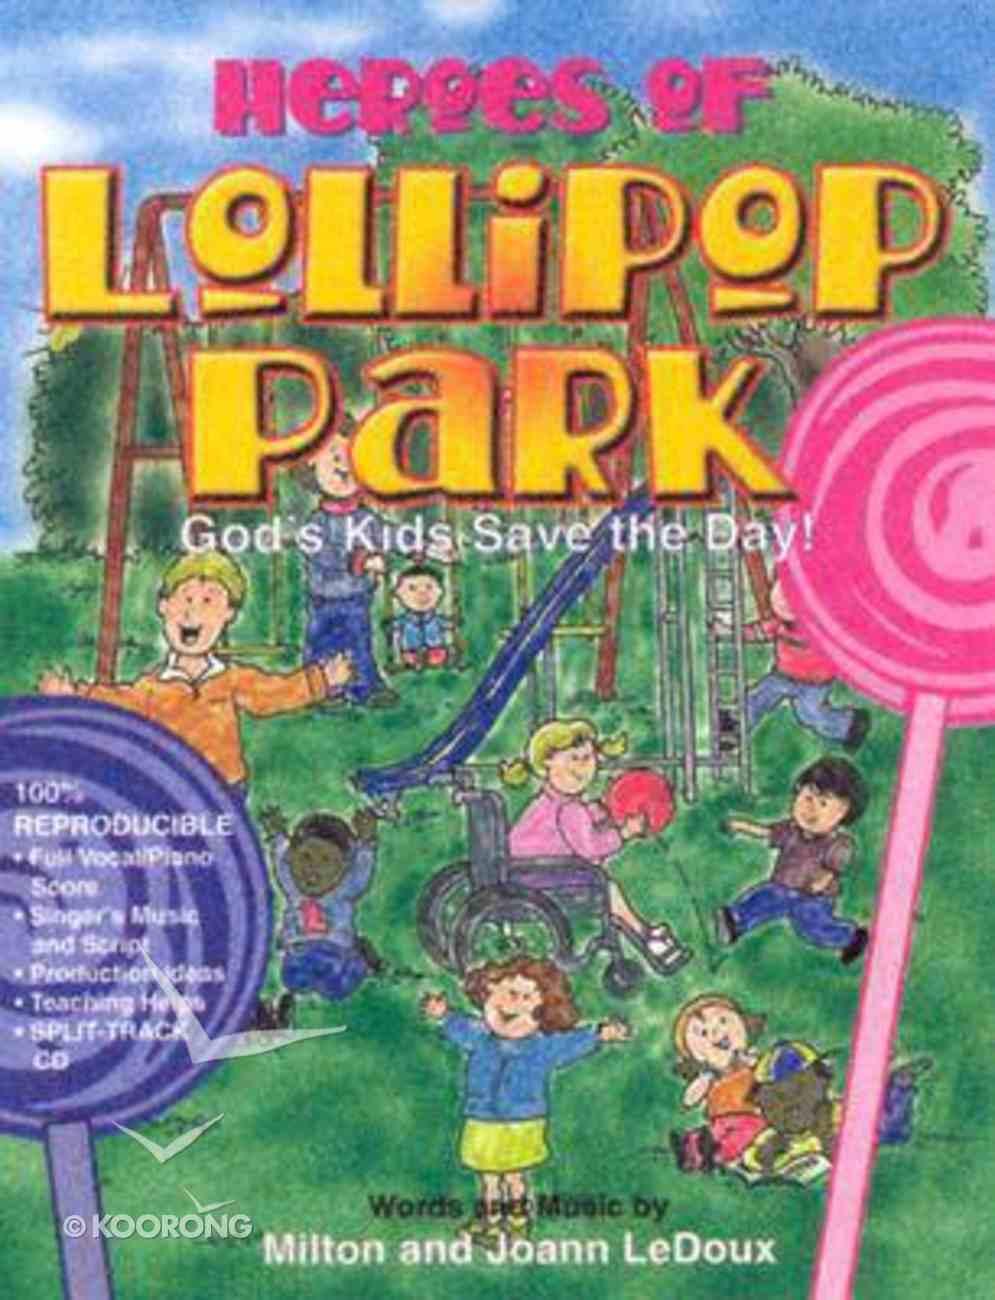 Heroes of Lollopop Park Paperback